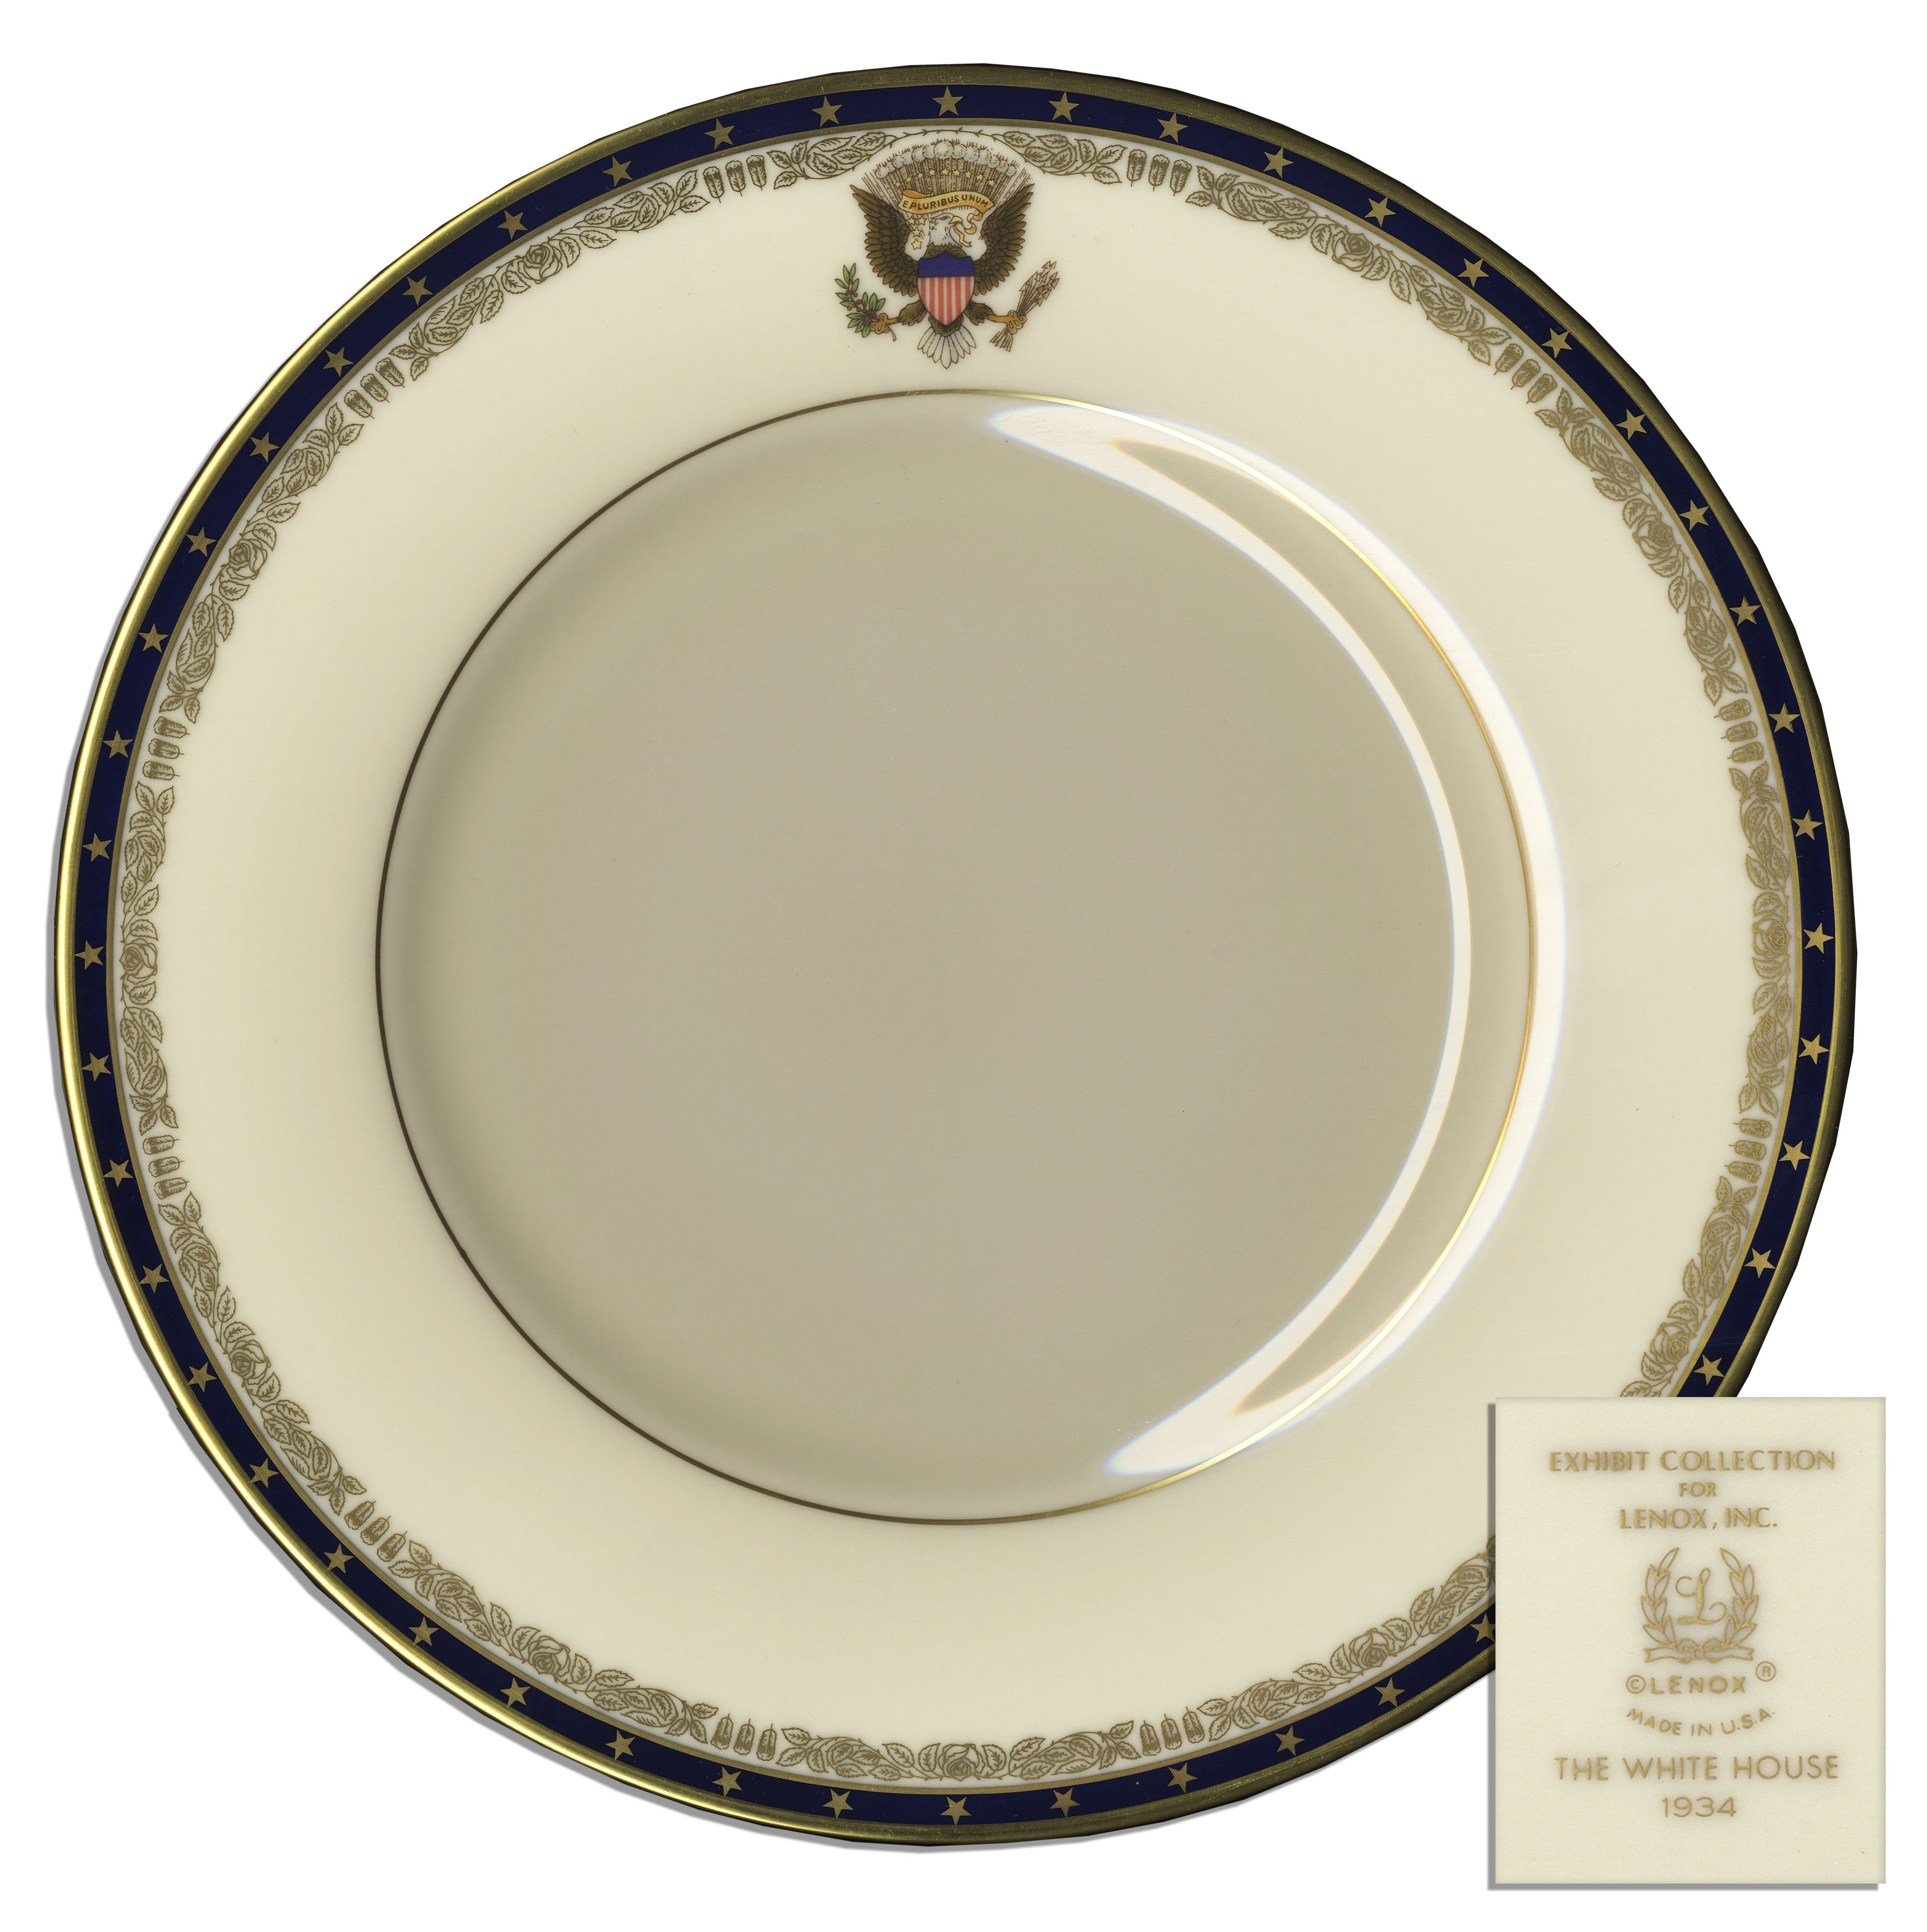 Franklin D. Roosevelt Memorabilia Sells for $17,365 at Auction